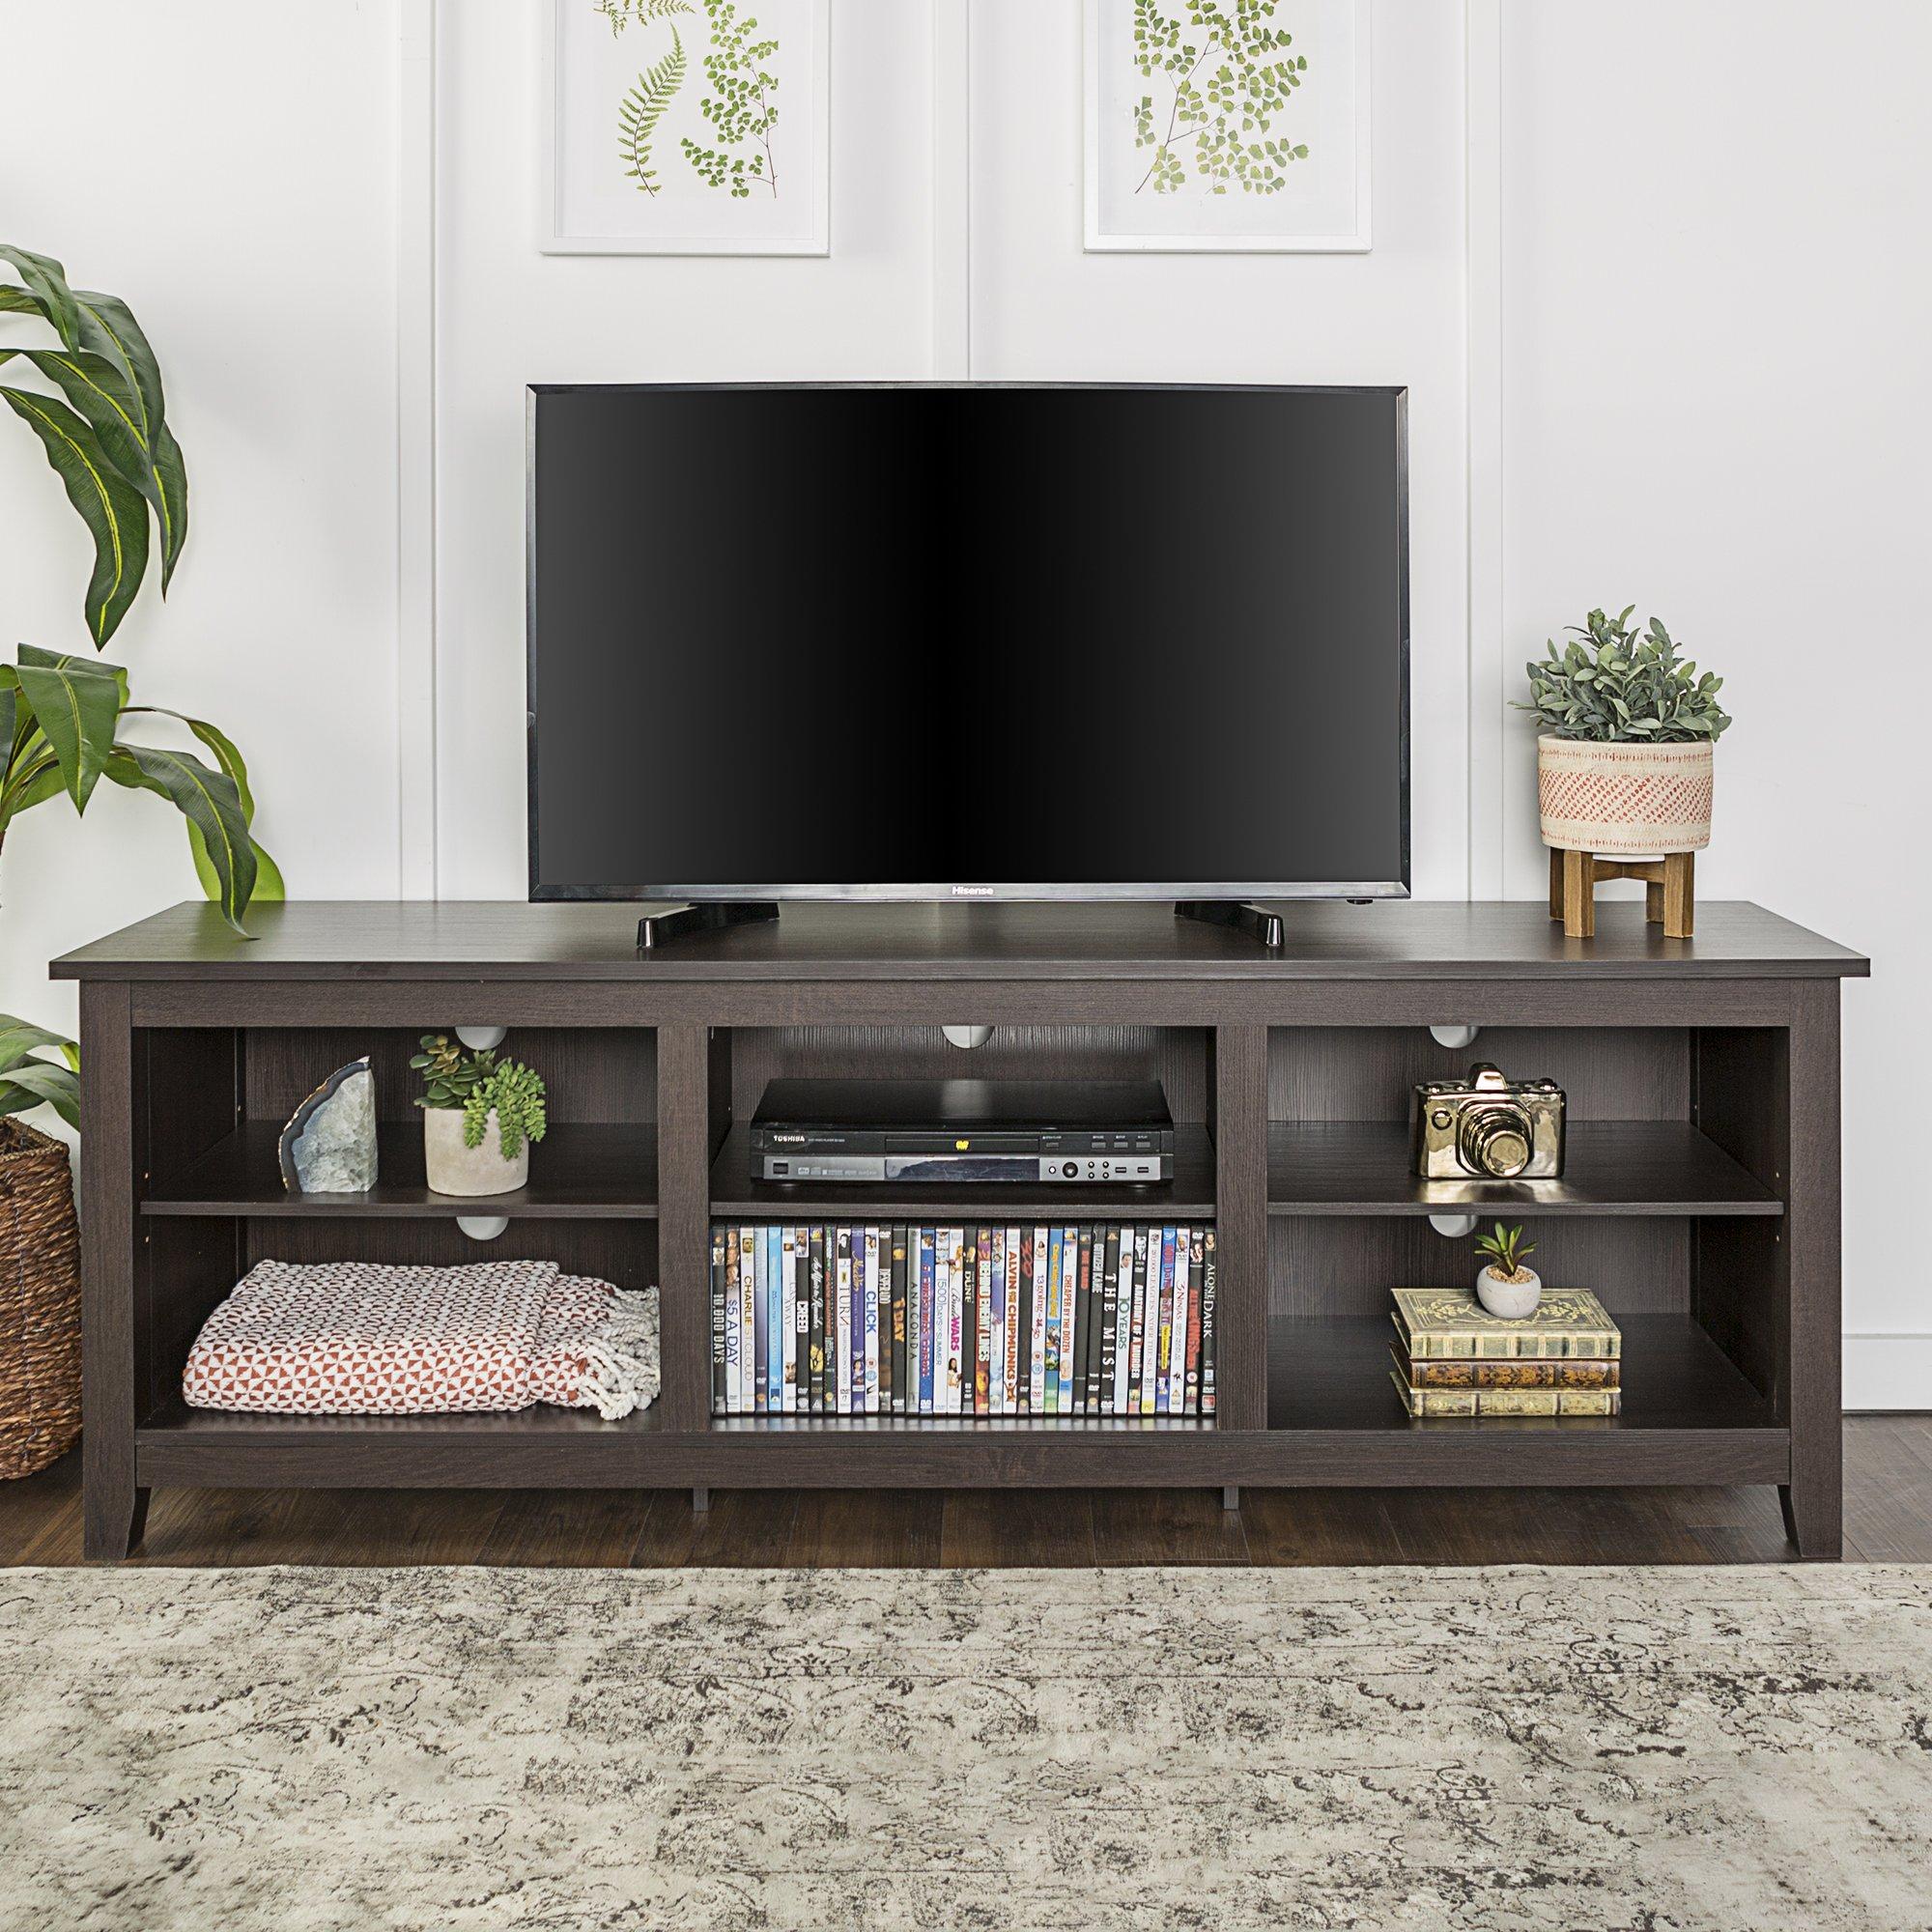 living room tv stand amazon com rh amazon com living room tv stand designs living room tv stand designs